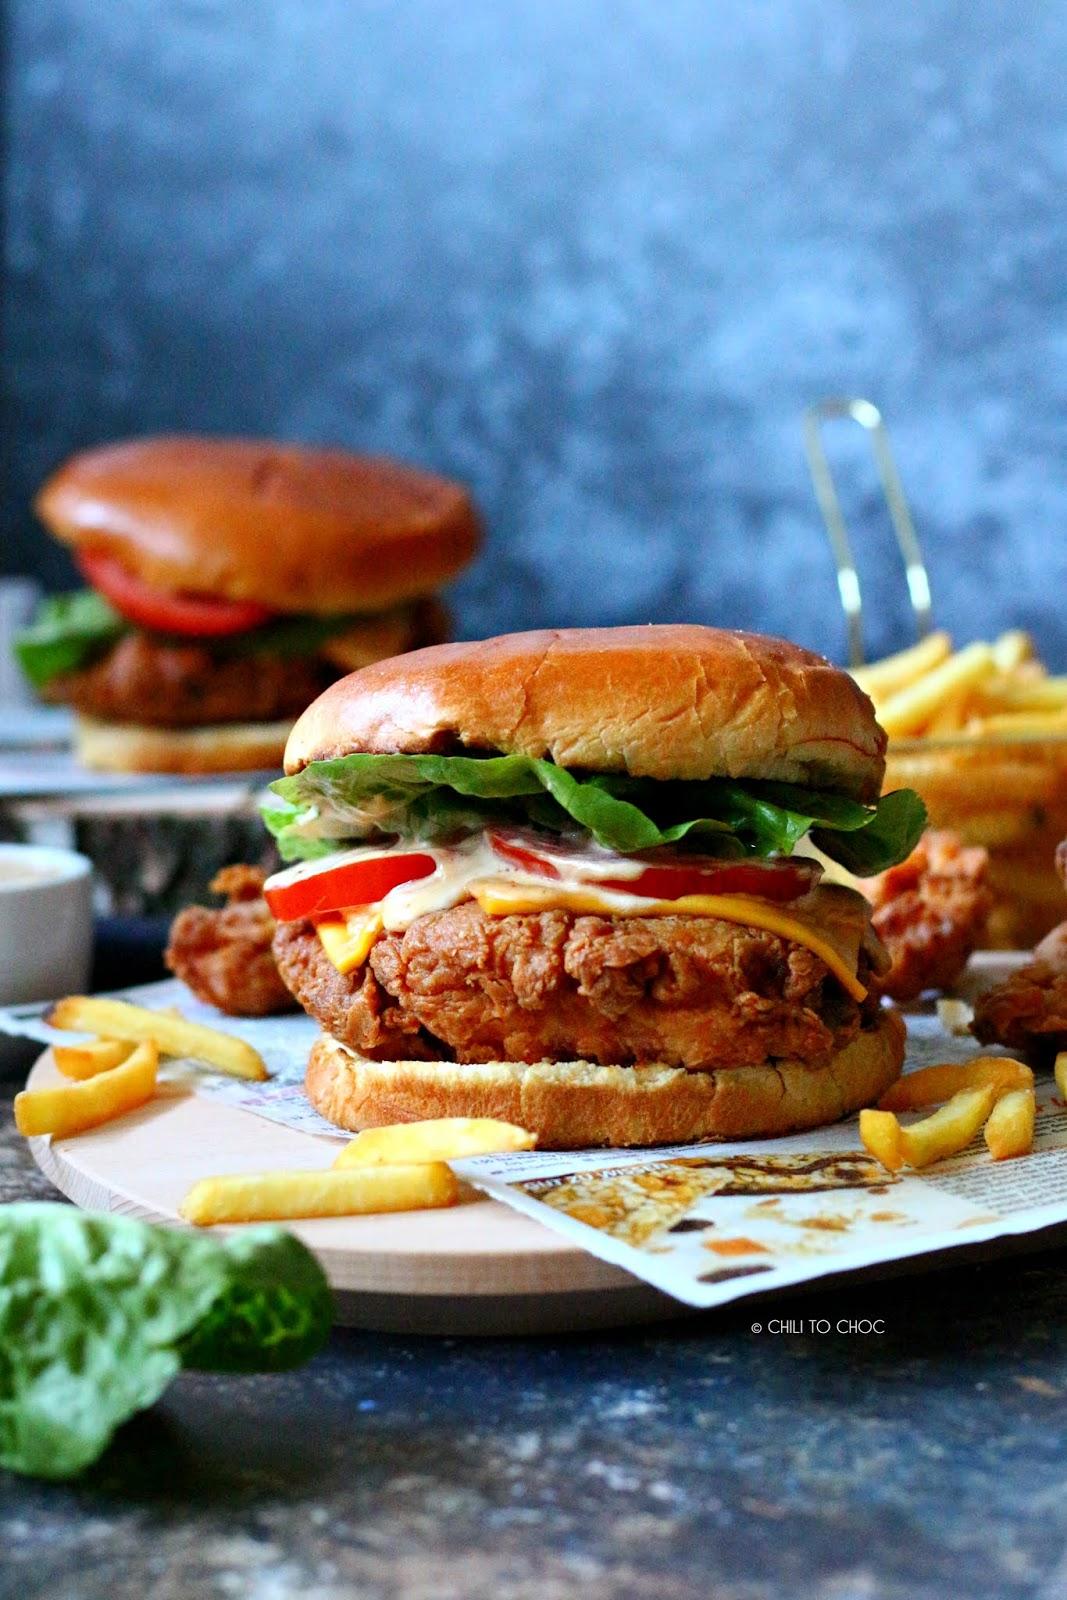 KFC-Style Crispy Chicken Burger (Zinger Burger) - photography